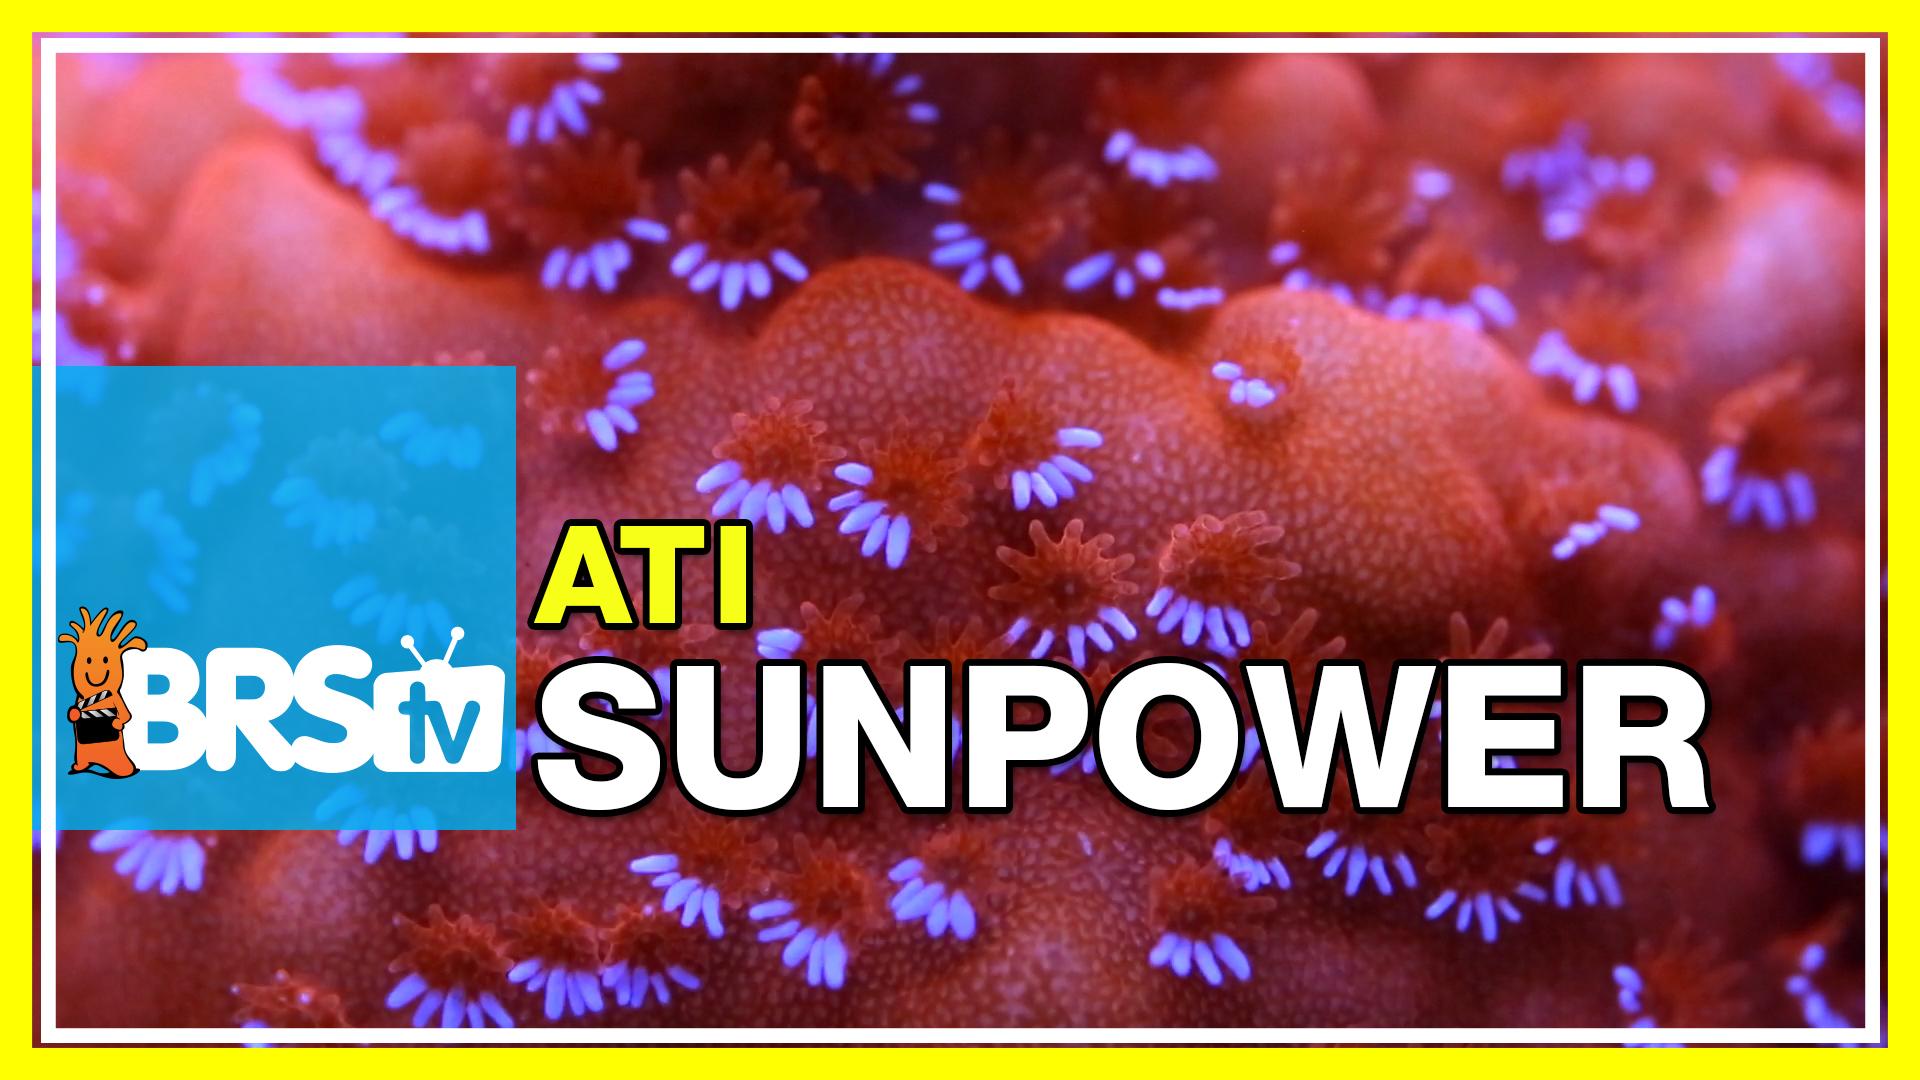 Performance Testing ATI's Sunpower T5 Fixture | BRStv Investigates